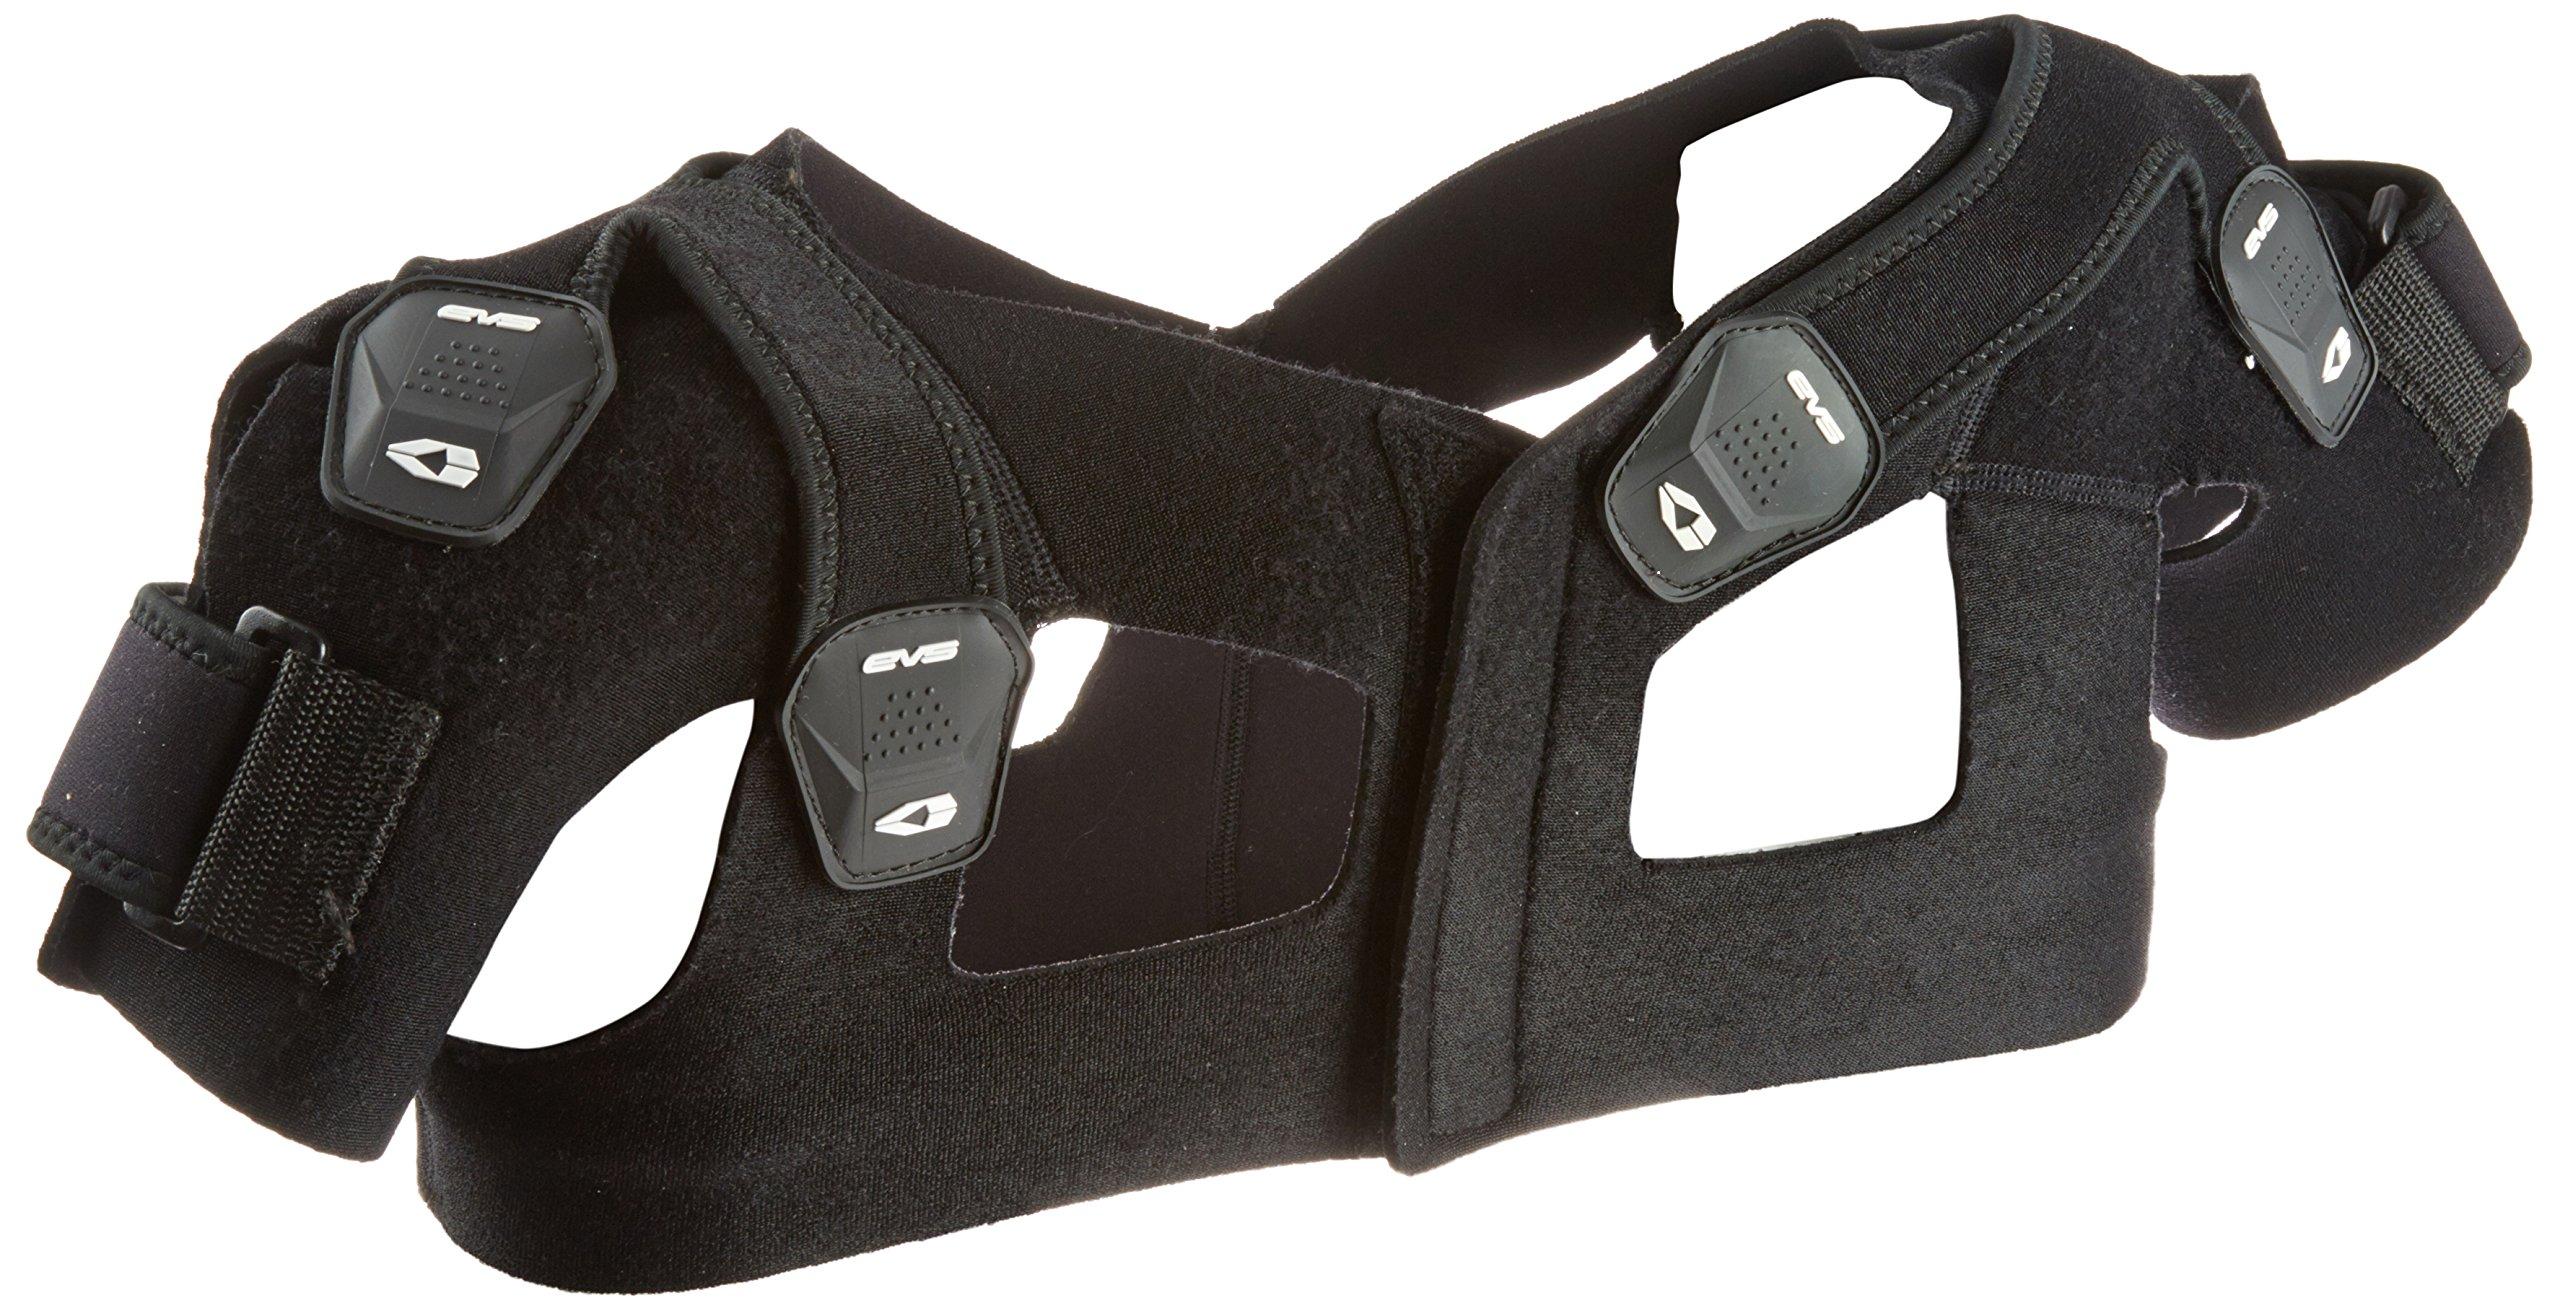 EVS Sports Shoulder Brace (Black, Small)